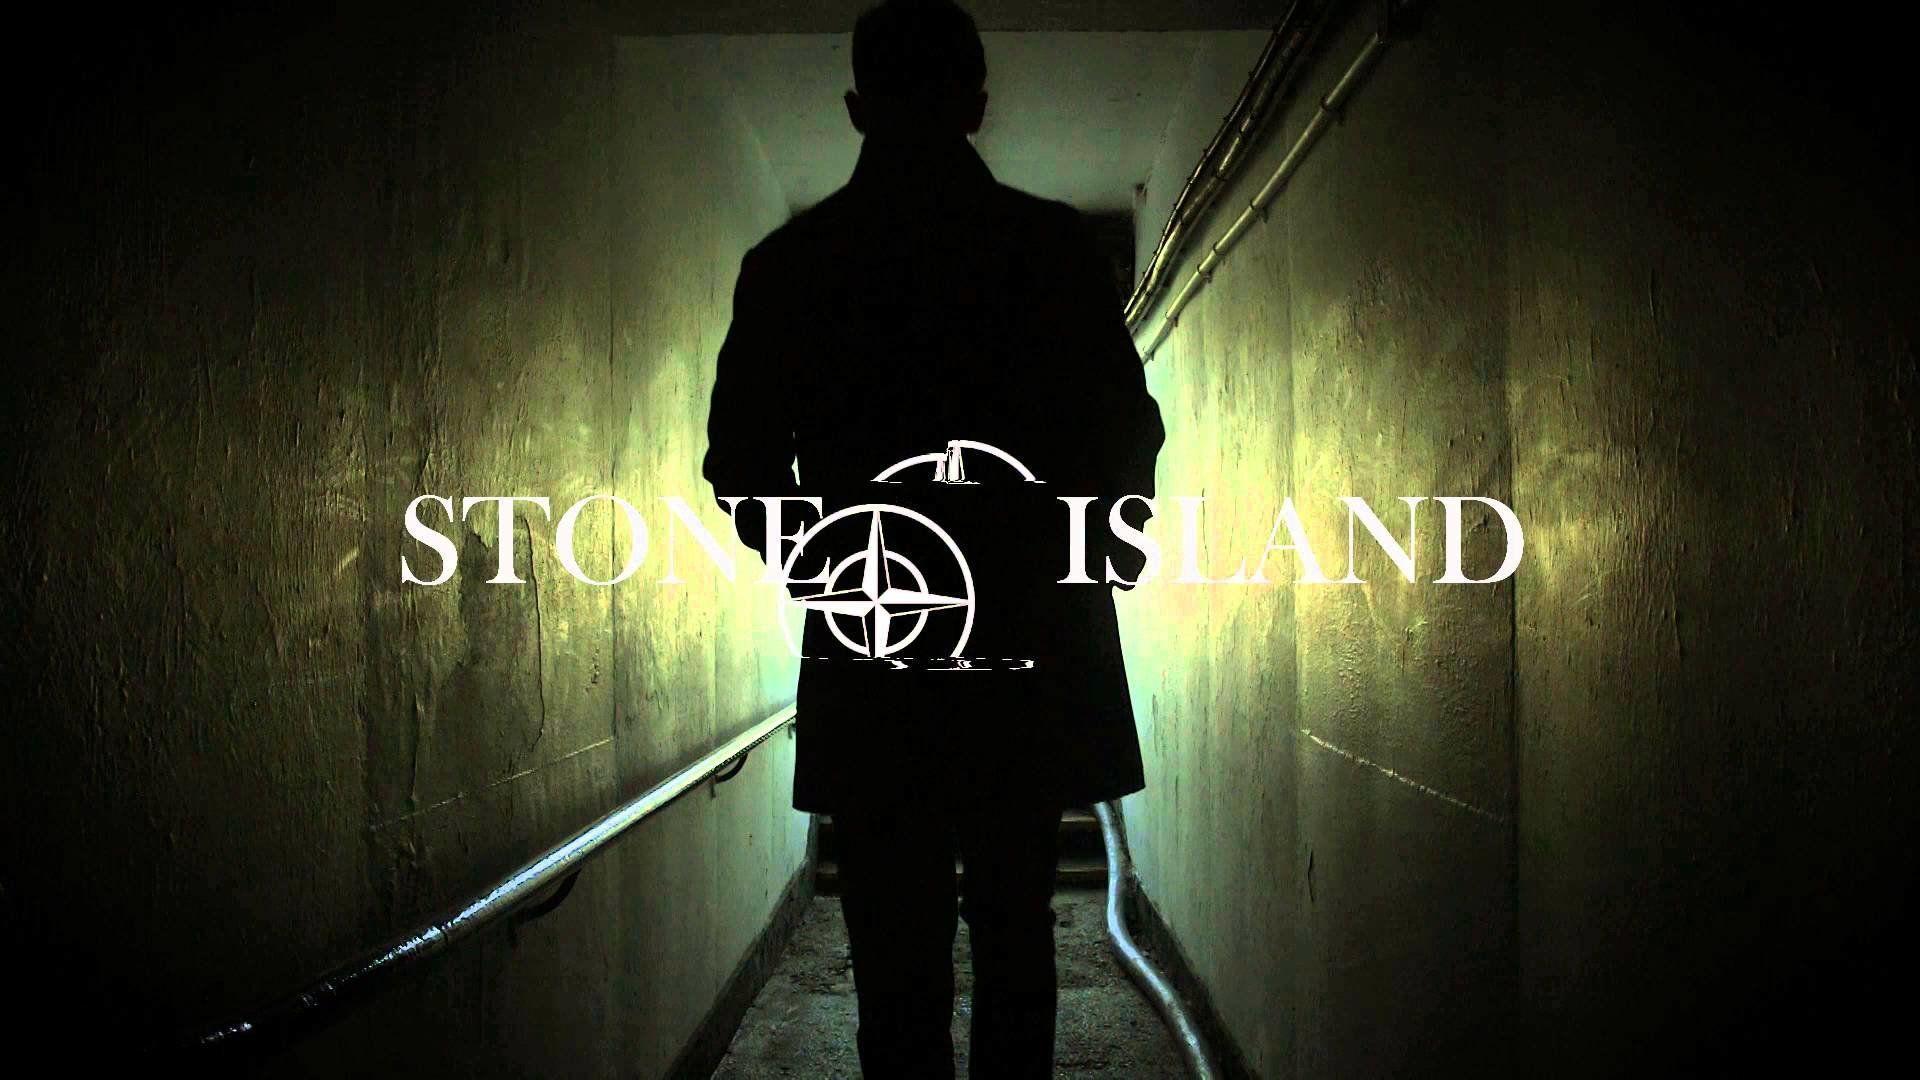 Stone Island Wallpapers Stone Island 252182 Hd